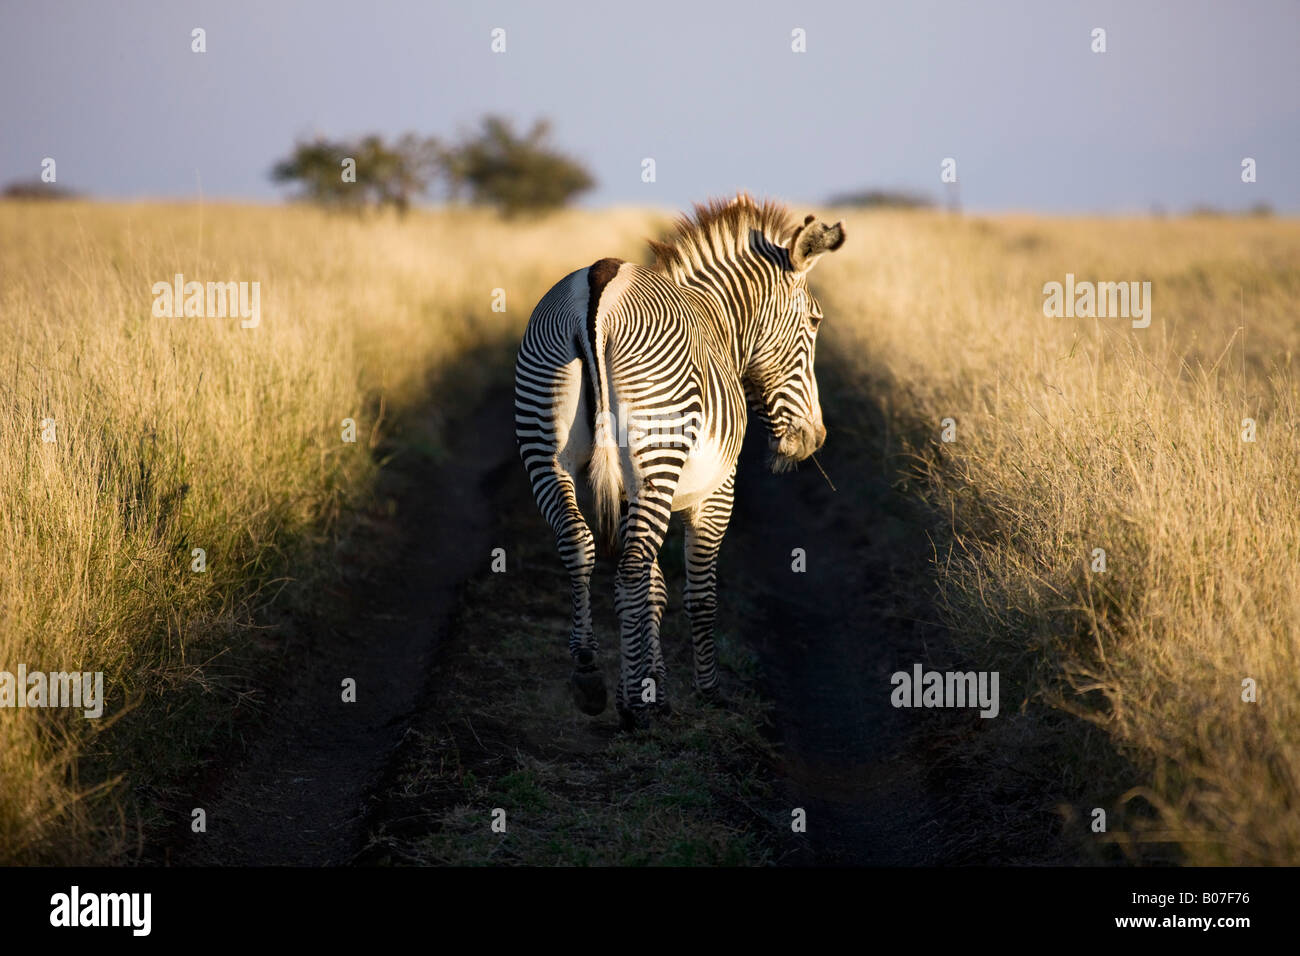 Grevy's zebra, Lewa Wildlife Conservancy, Kenya - Stock Image